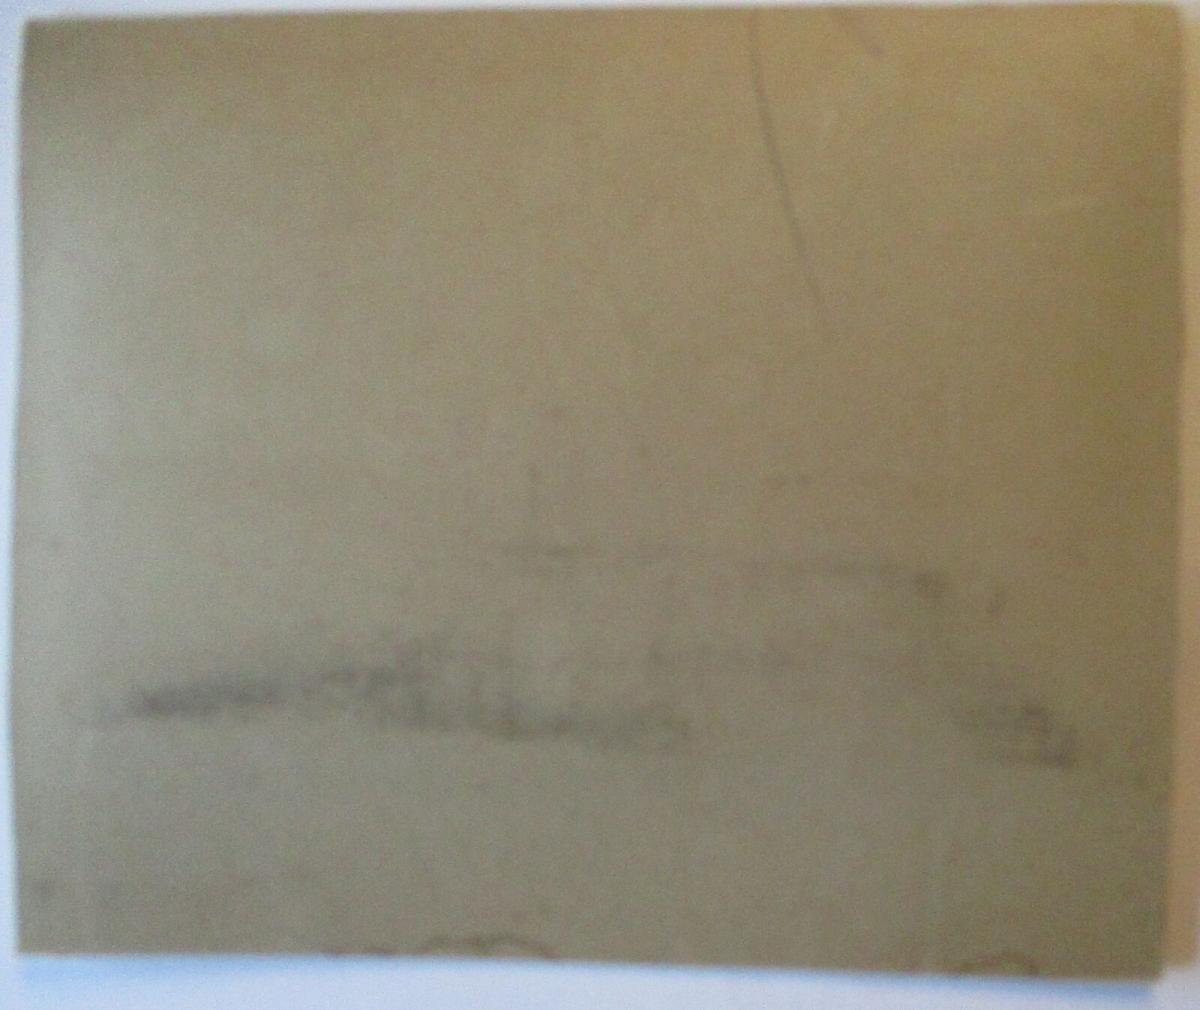 Junge Männer, original Foto 14x10 cm auf Pappe ca. 1900 (44759) 1